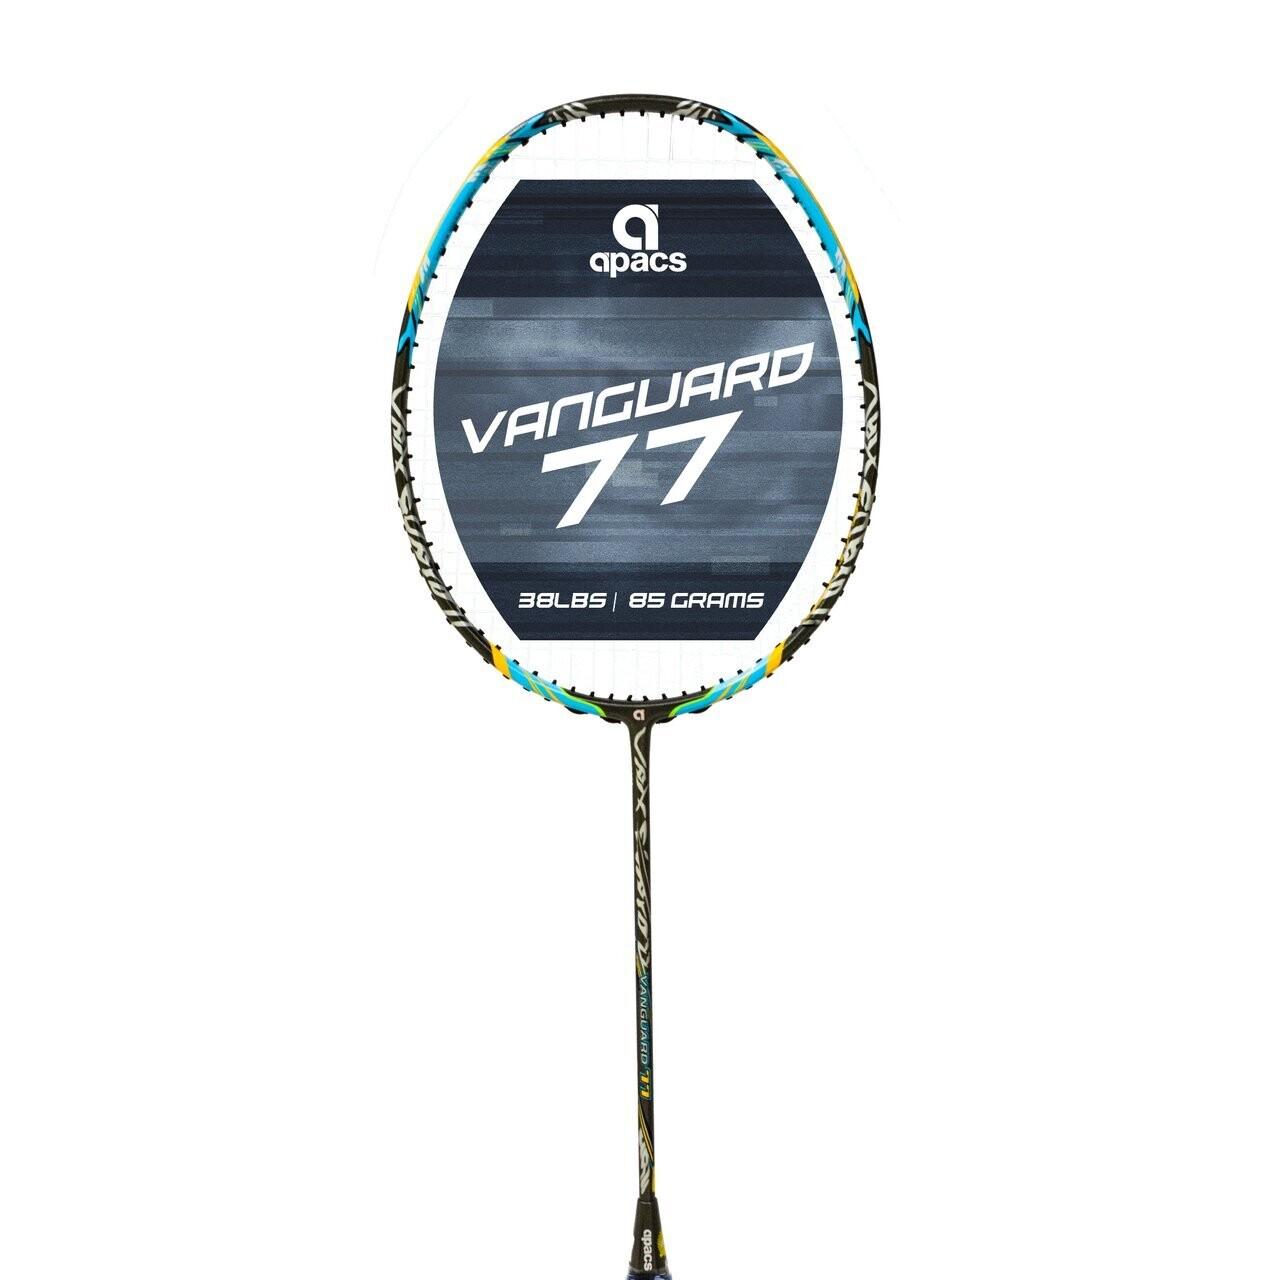 Apacs Vanguard 77 Black Badminton Racket